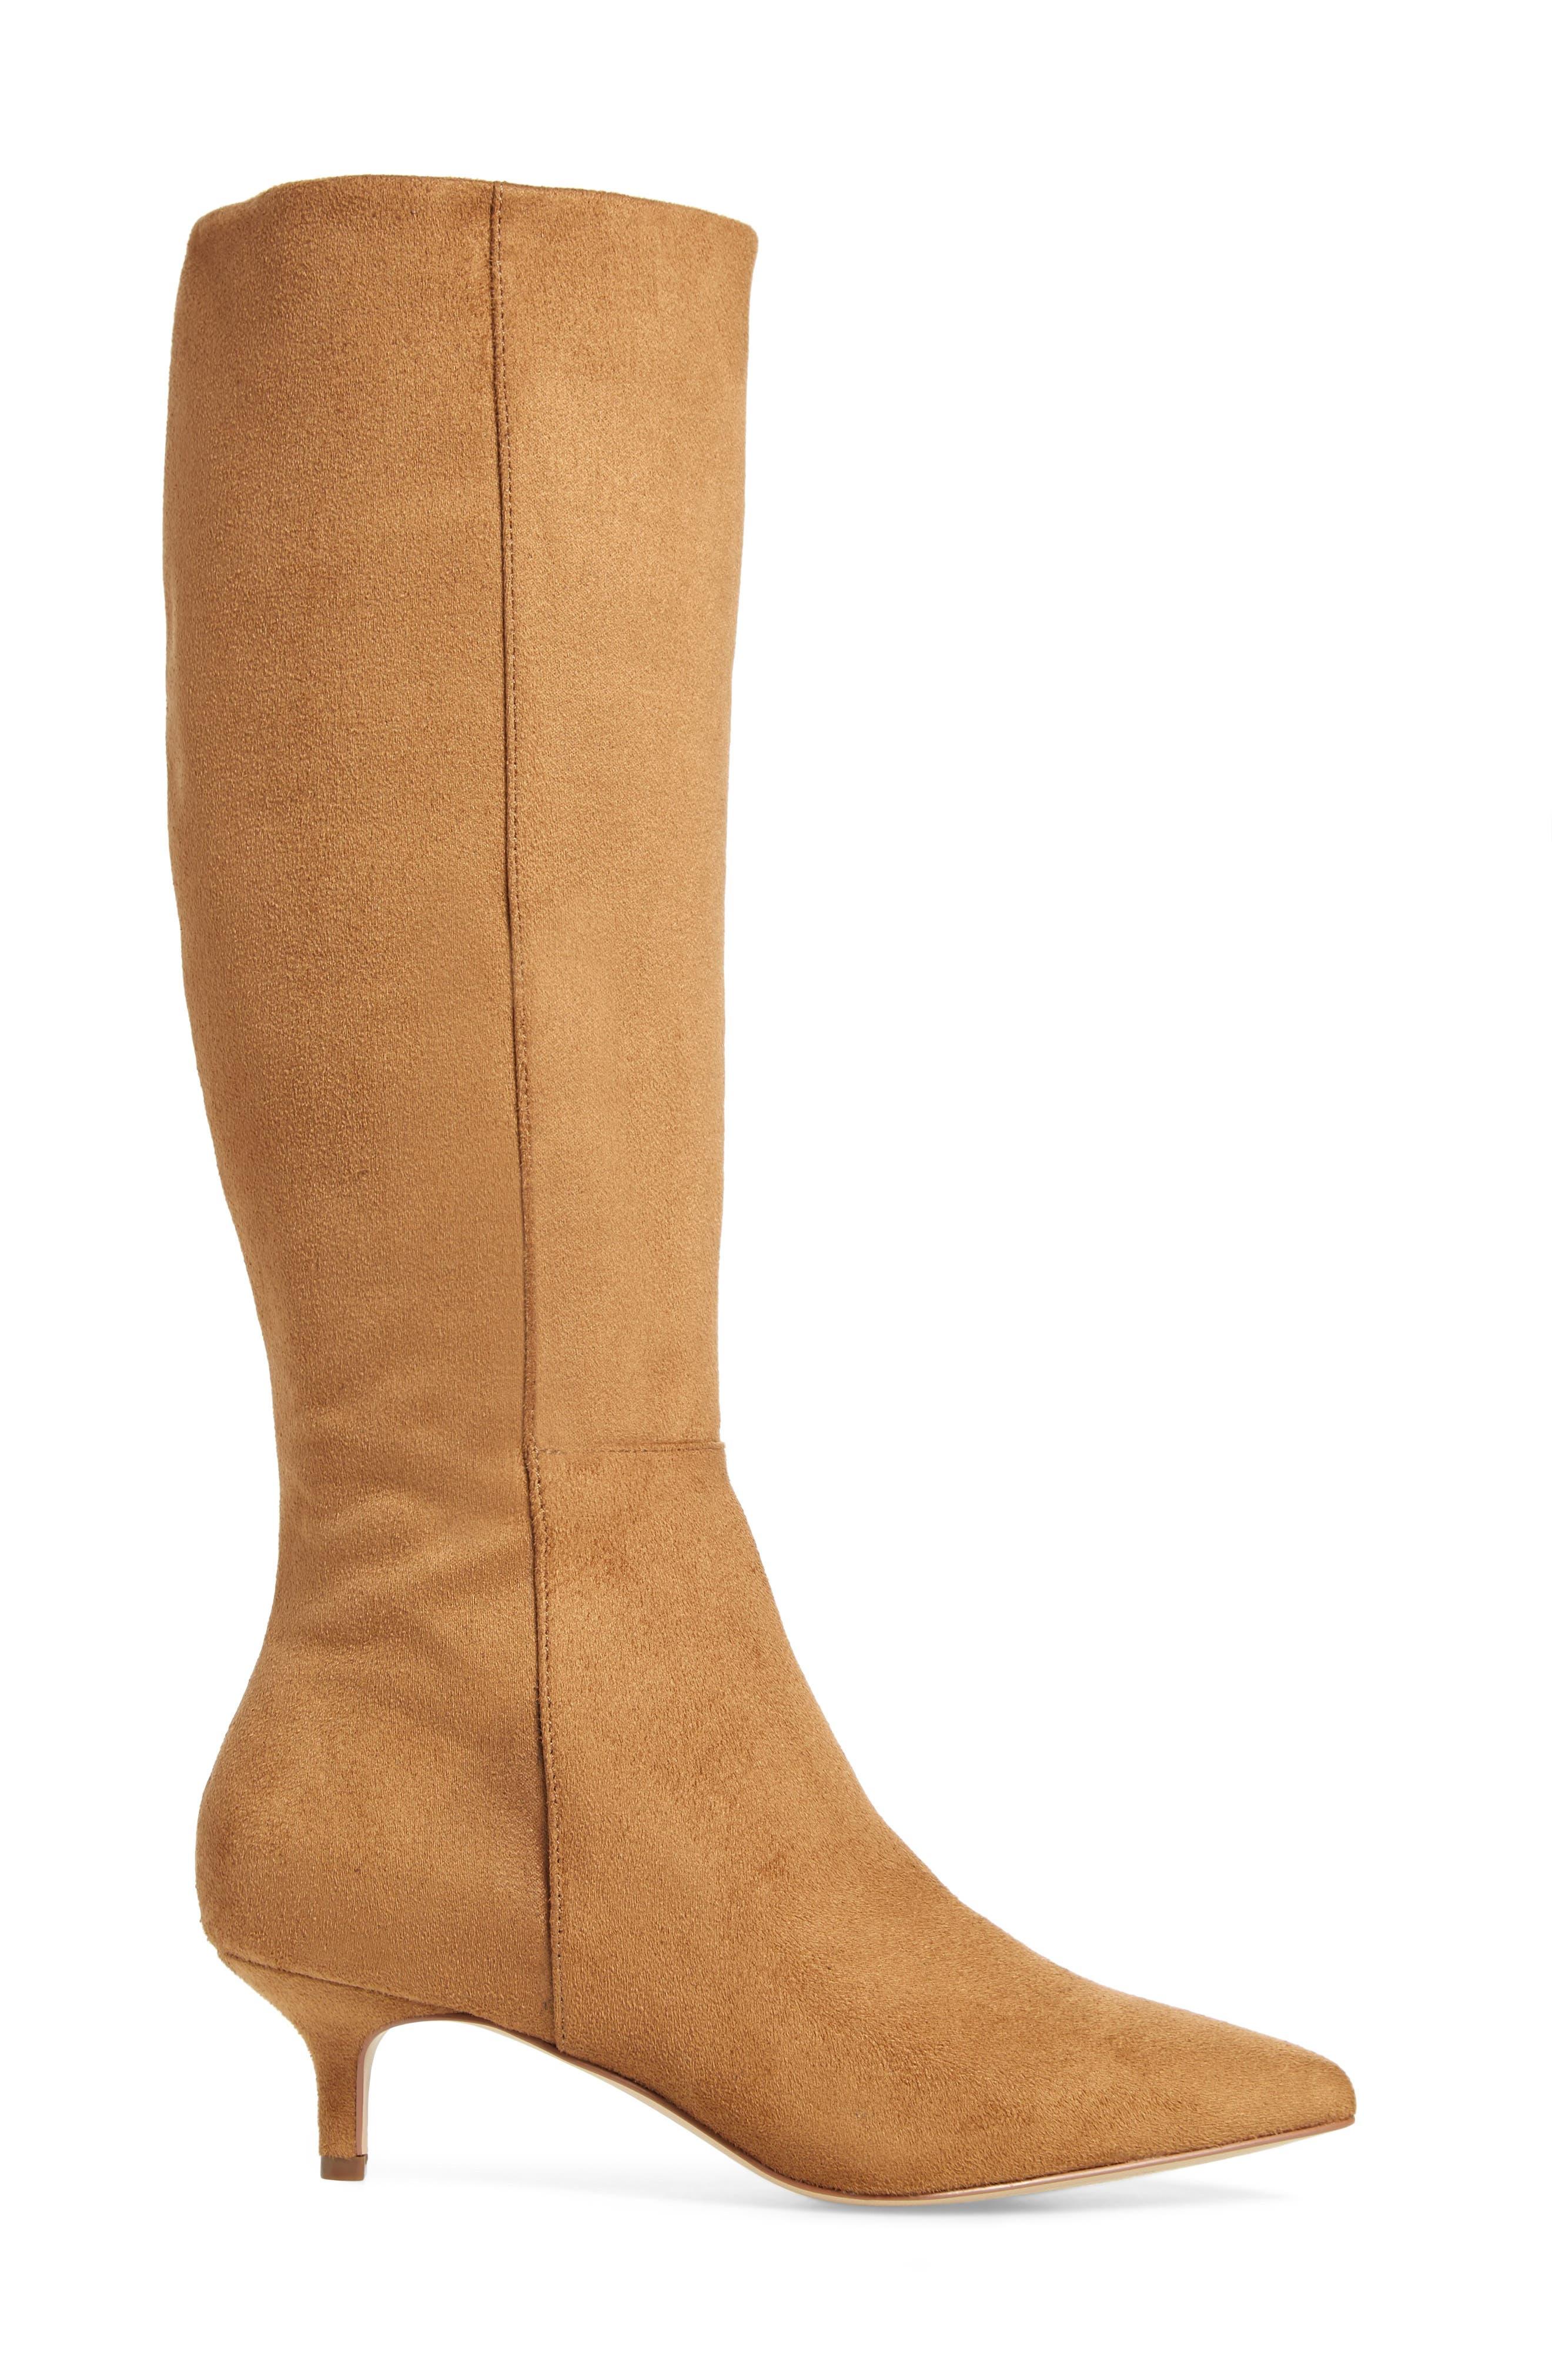 Lyon Knee High Boot,                             Alternate thumbnail 3, color,                             200